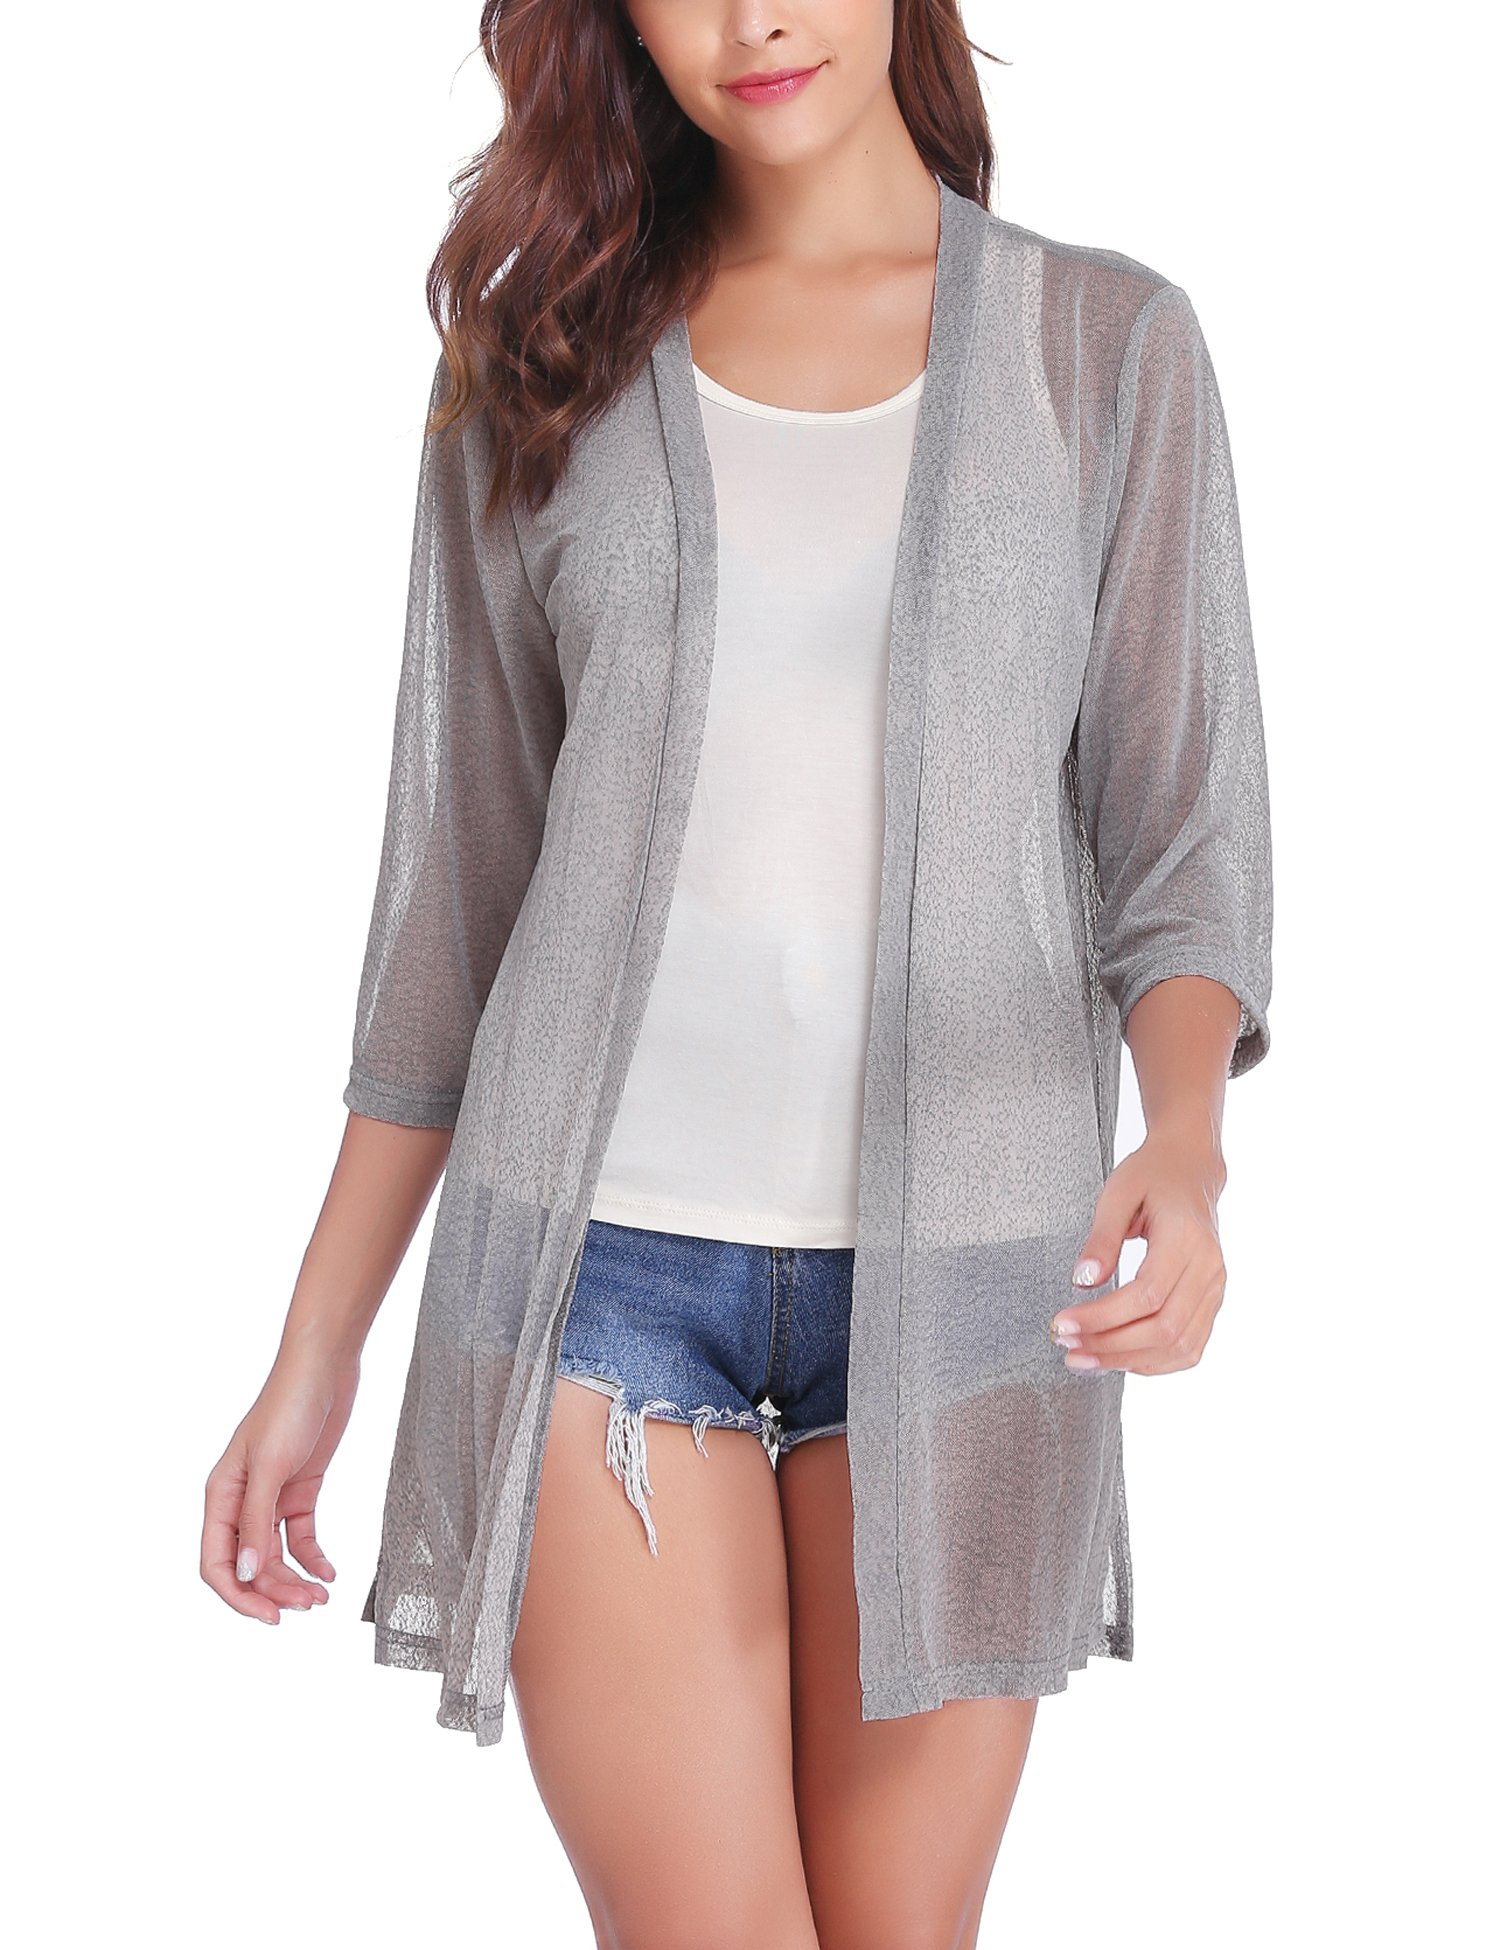 iClosam Women Casual 3/4 Sleeve Sheer Open Front Cardigan Sweater (Grey, X-Large)